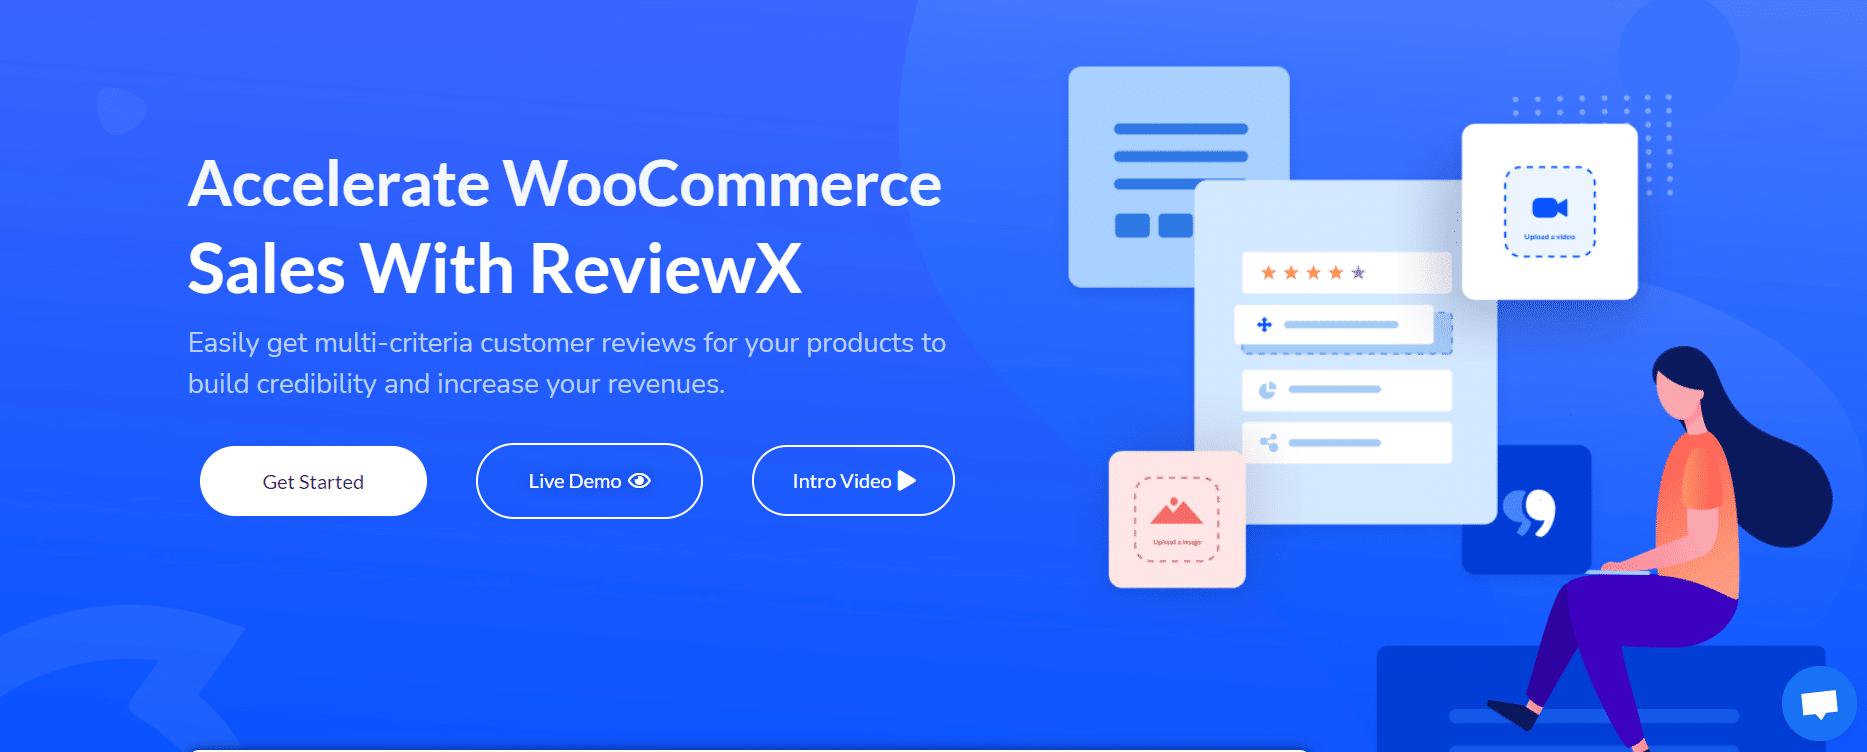 WooCommerce business